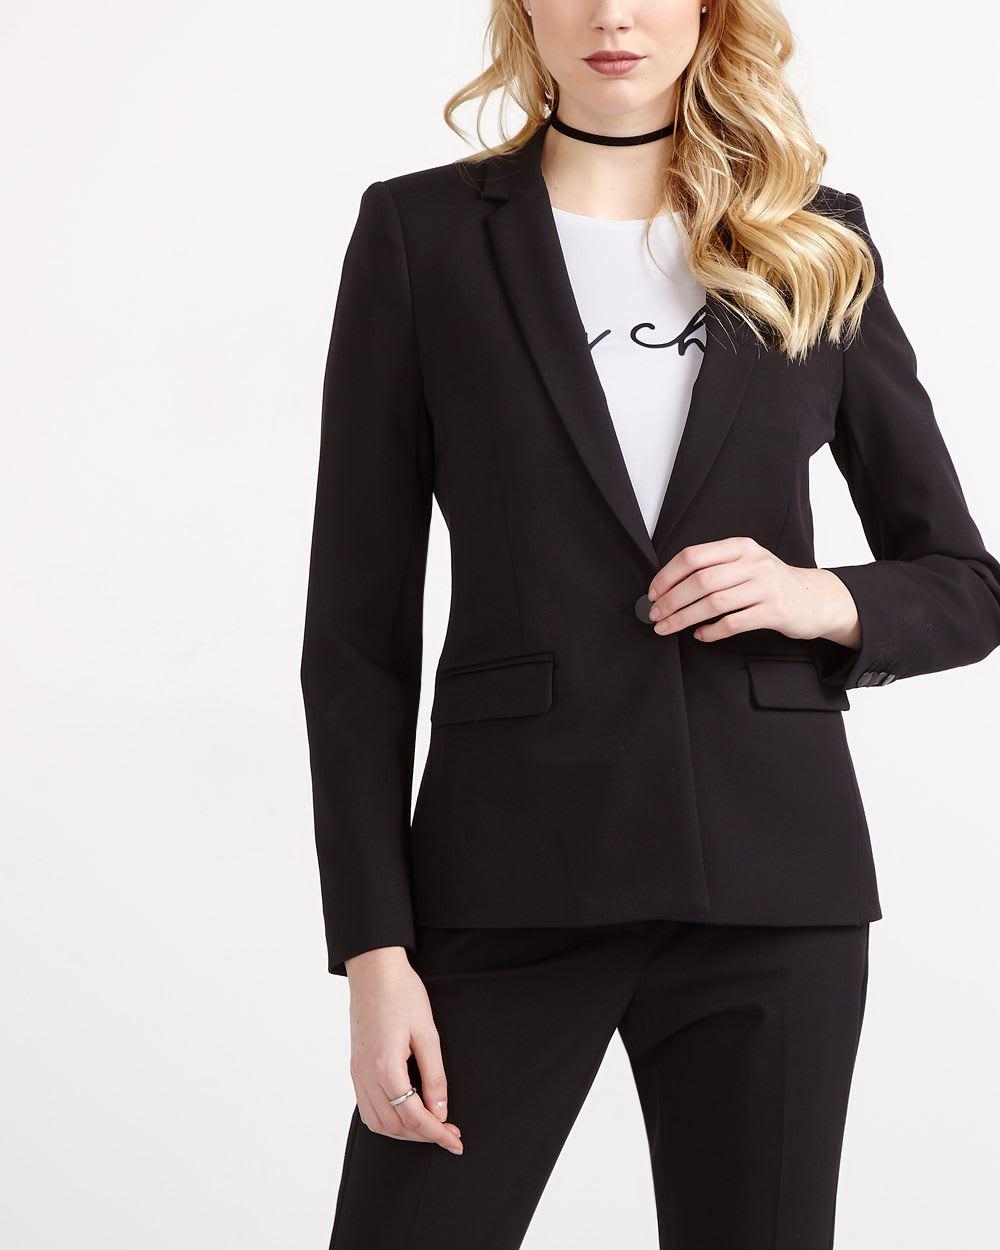 Willow & Thread Long Sleeve Blazer